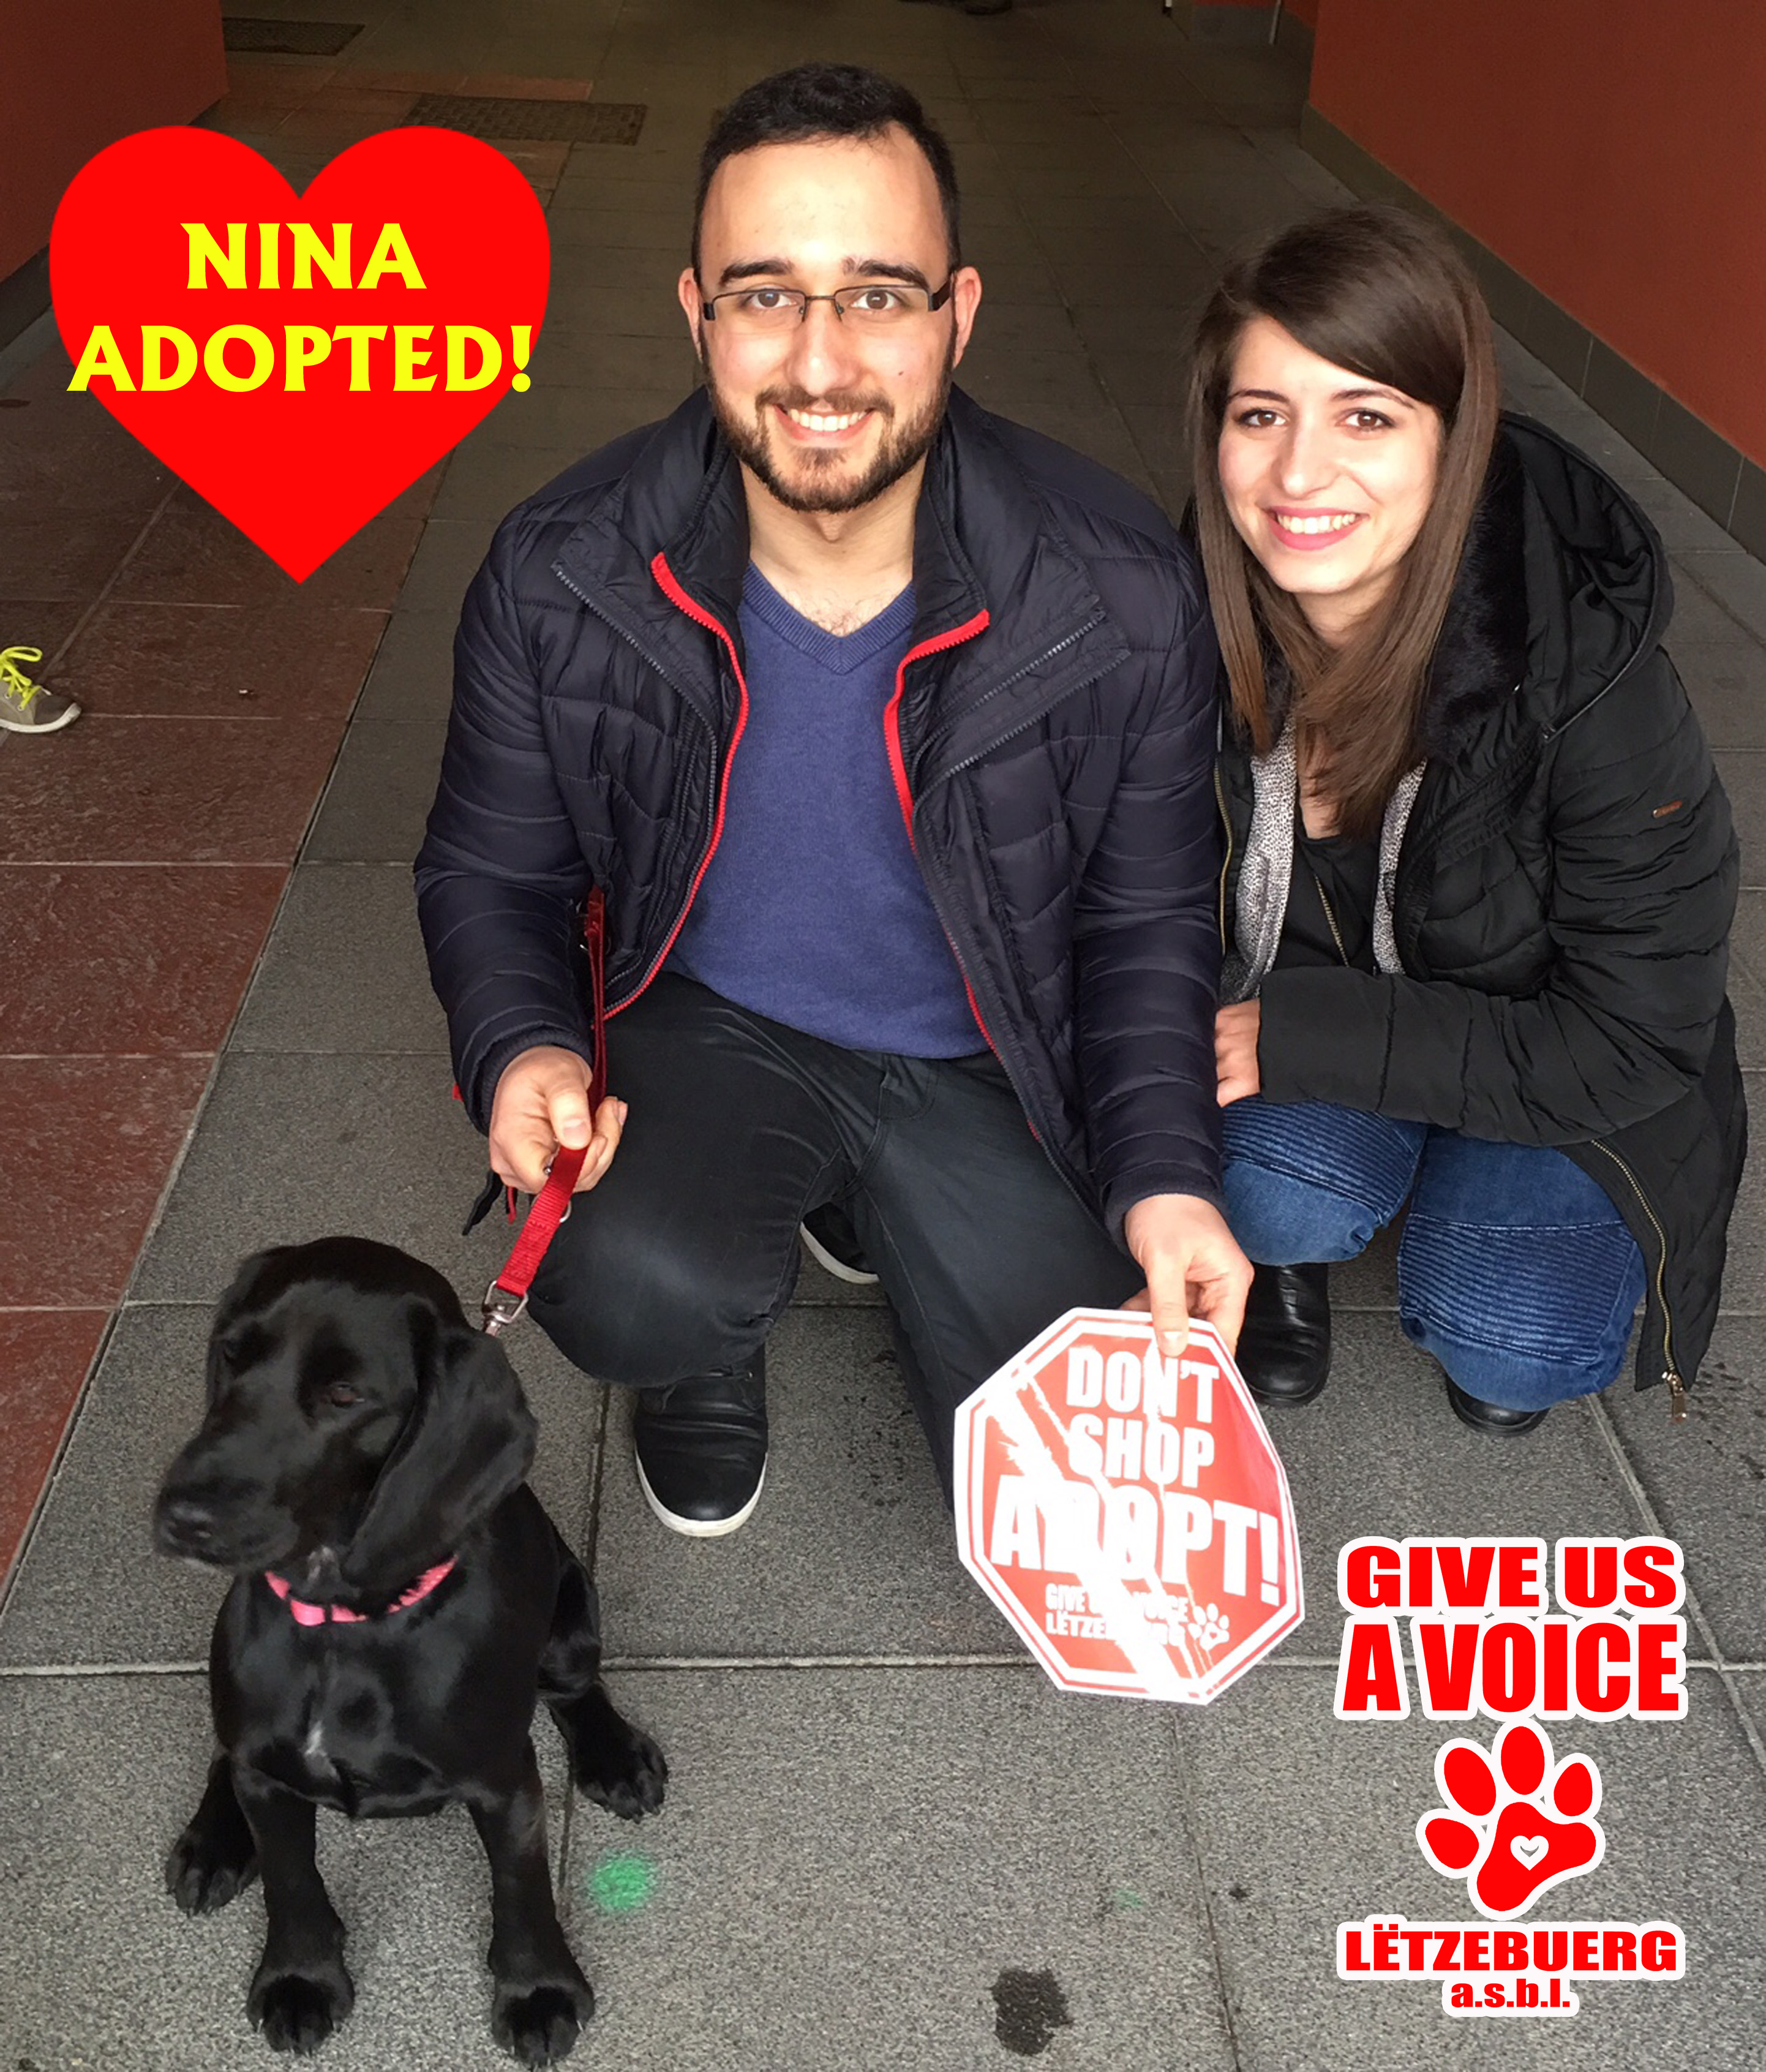 Nina adopted! copy